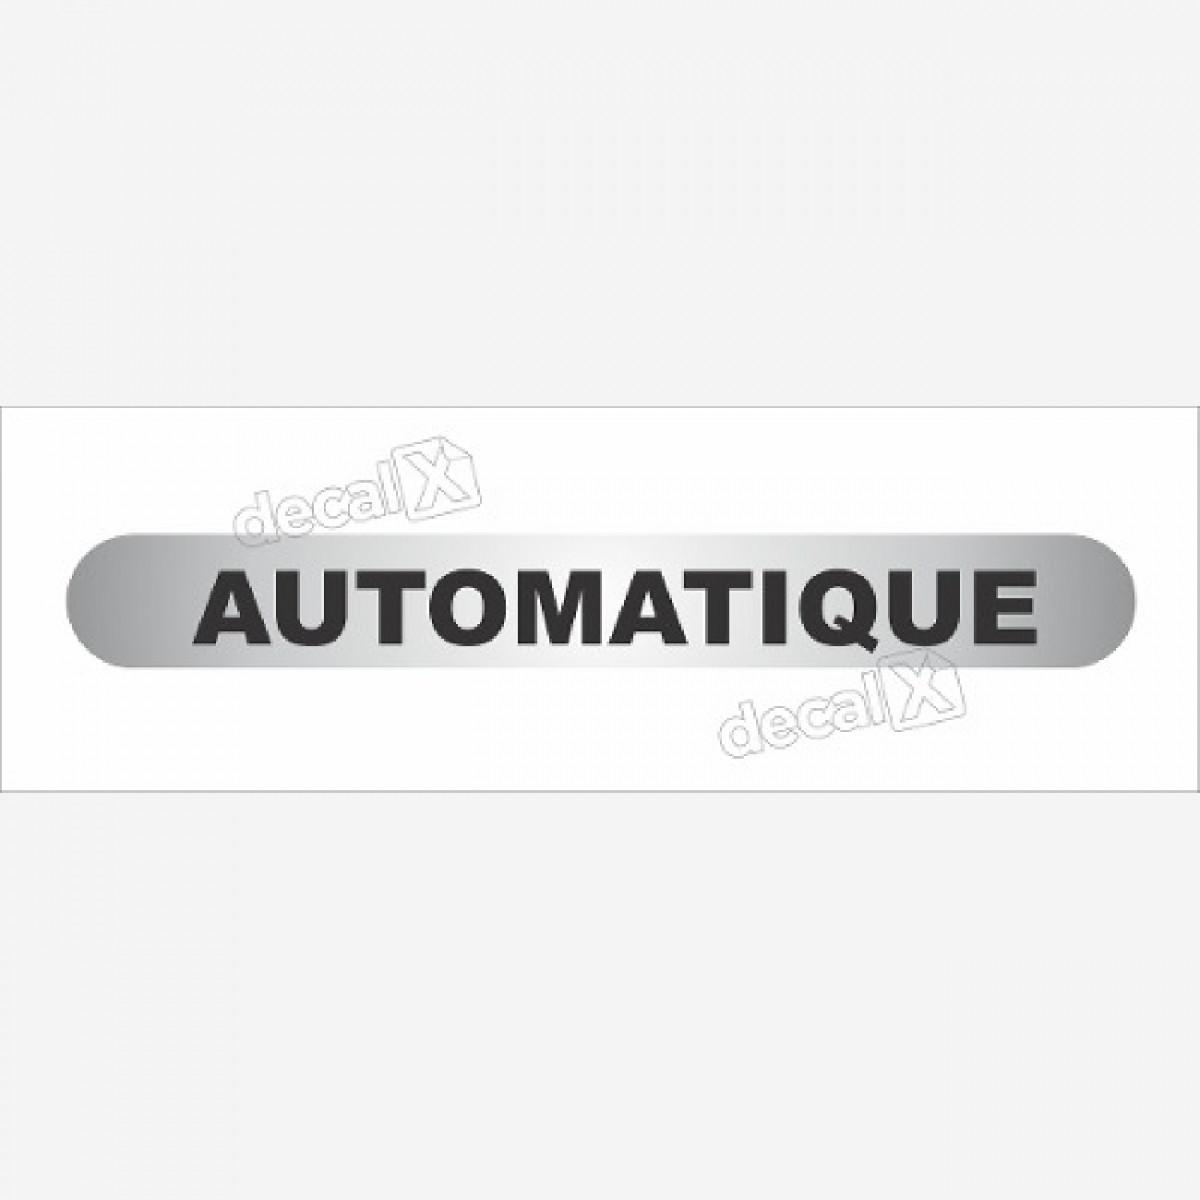 Emblema Adesivo Automatic Citroen C3 C4 Todos Resinado